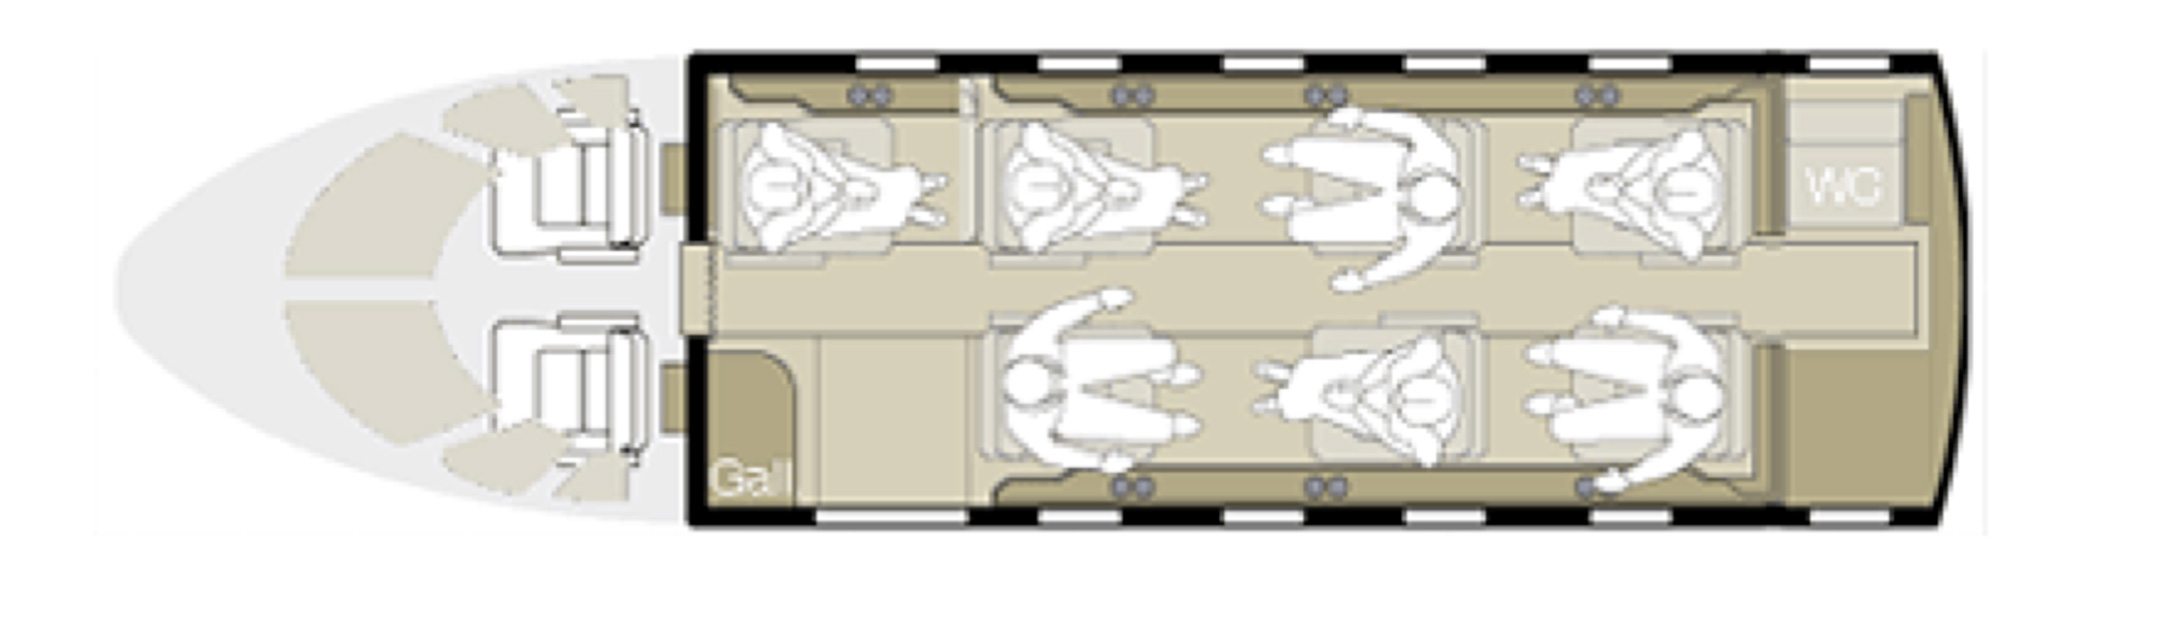 Floor plan of Citation Bravo